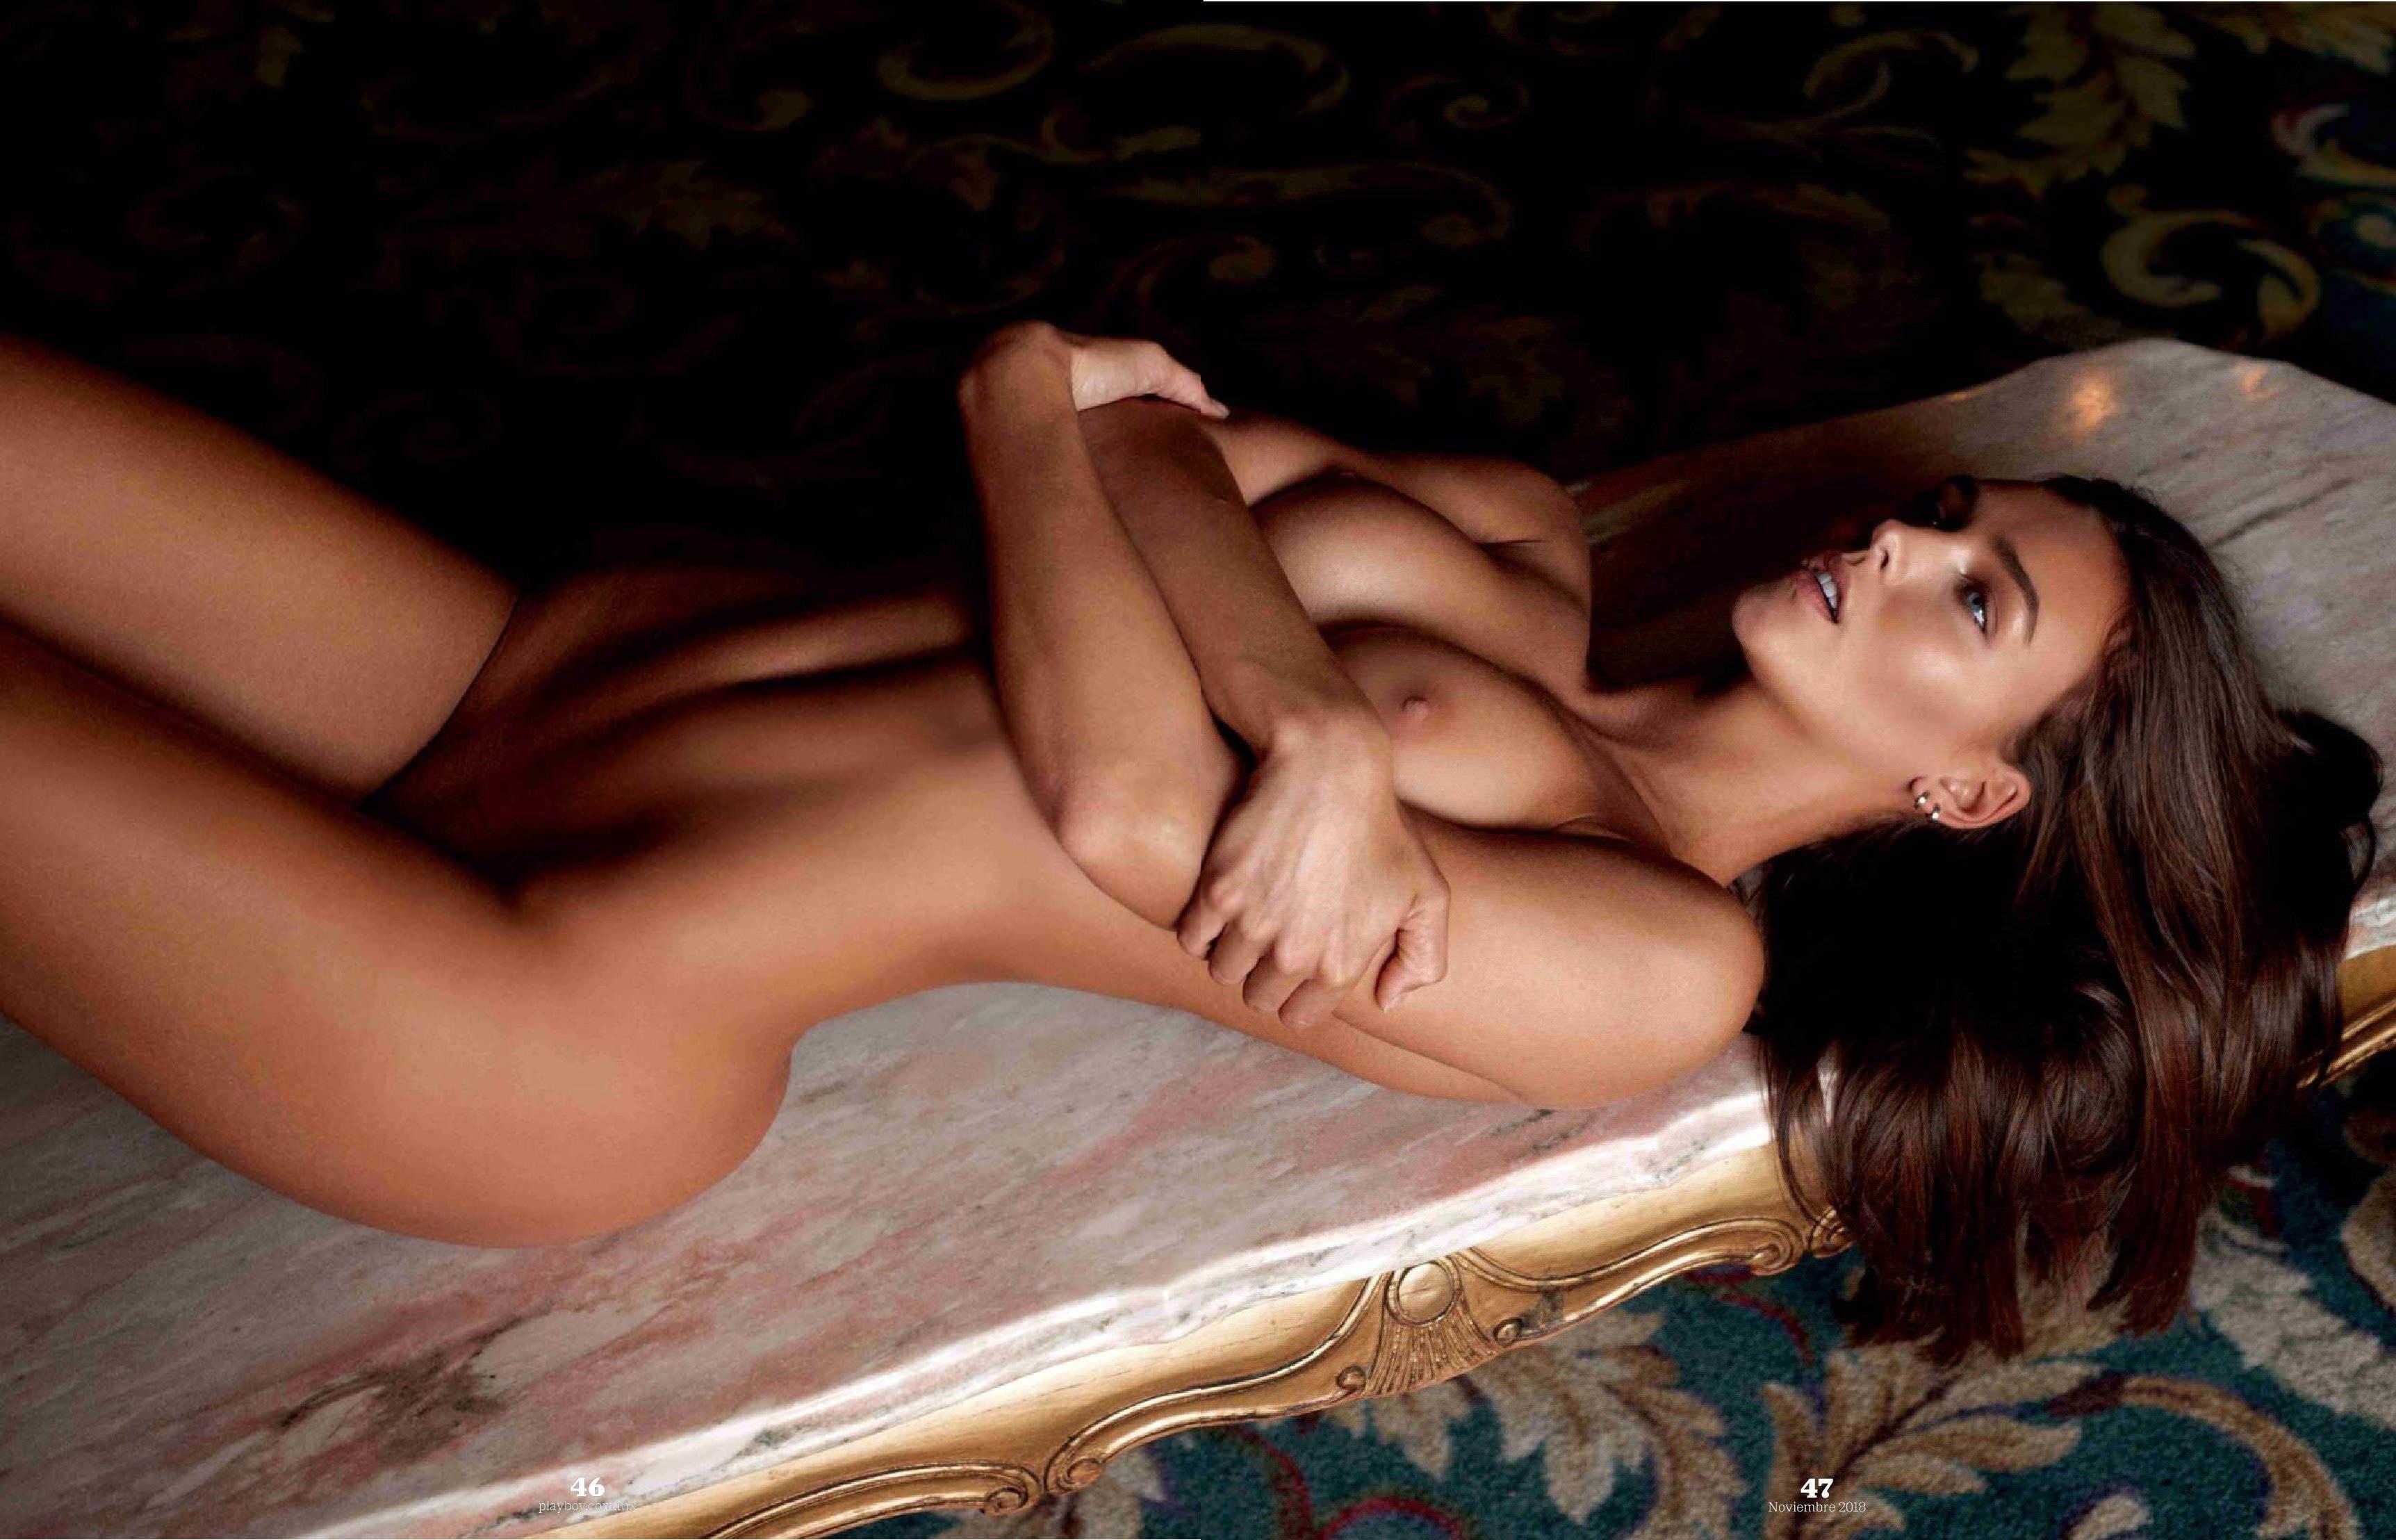 Rachel leigh cook nude